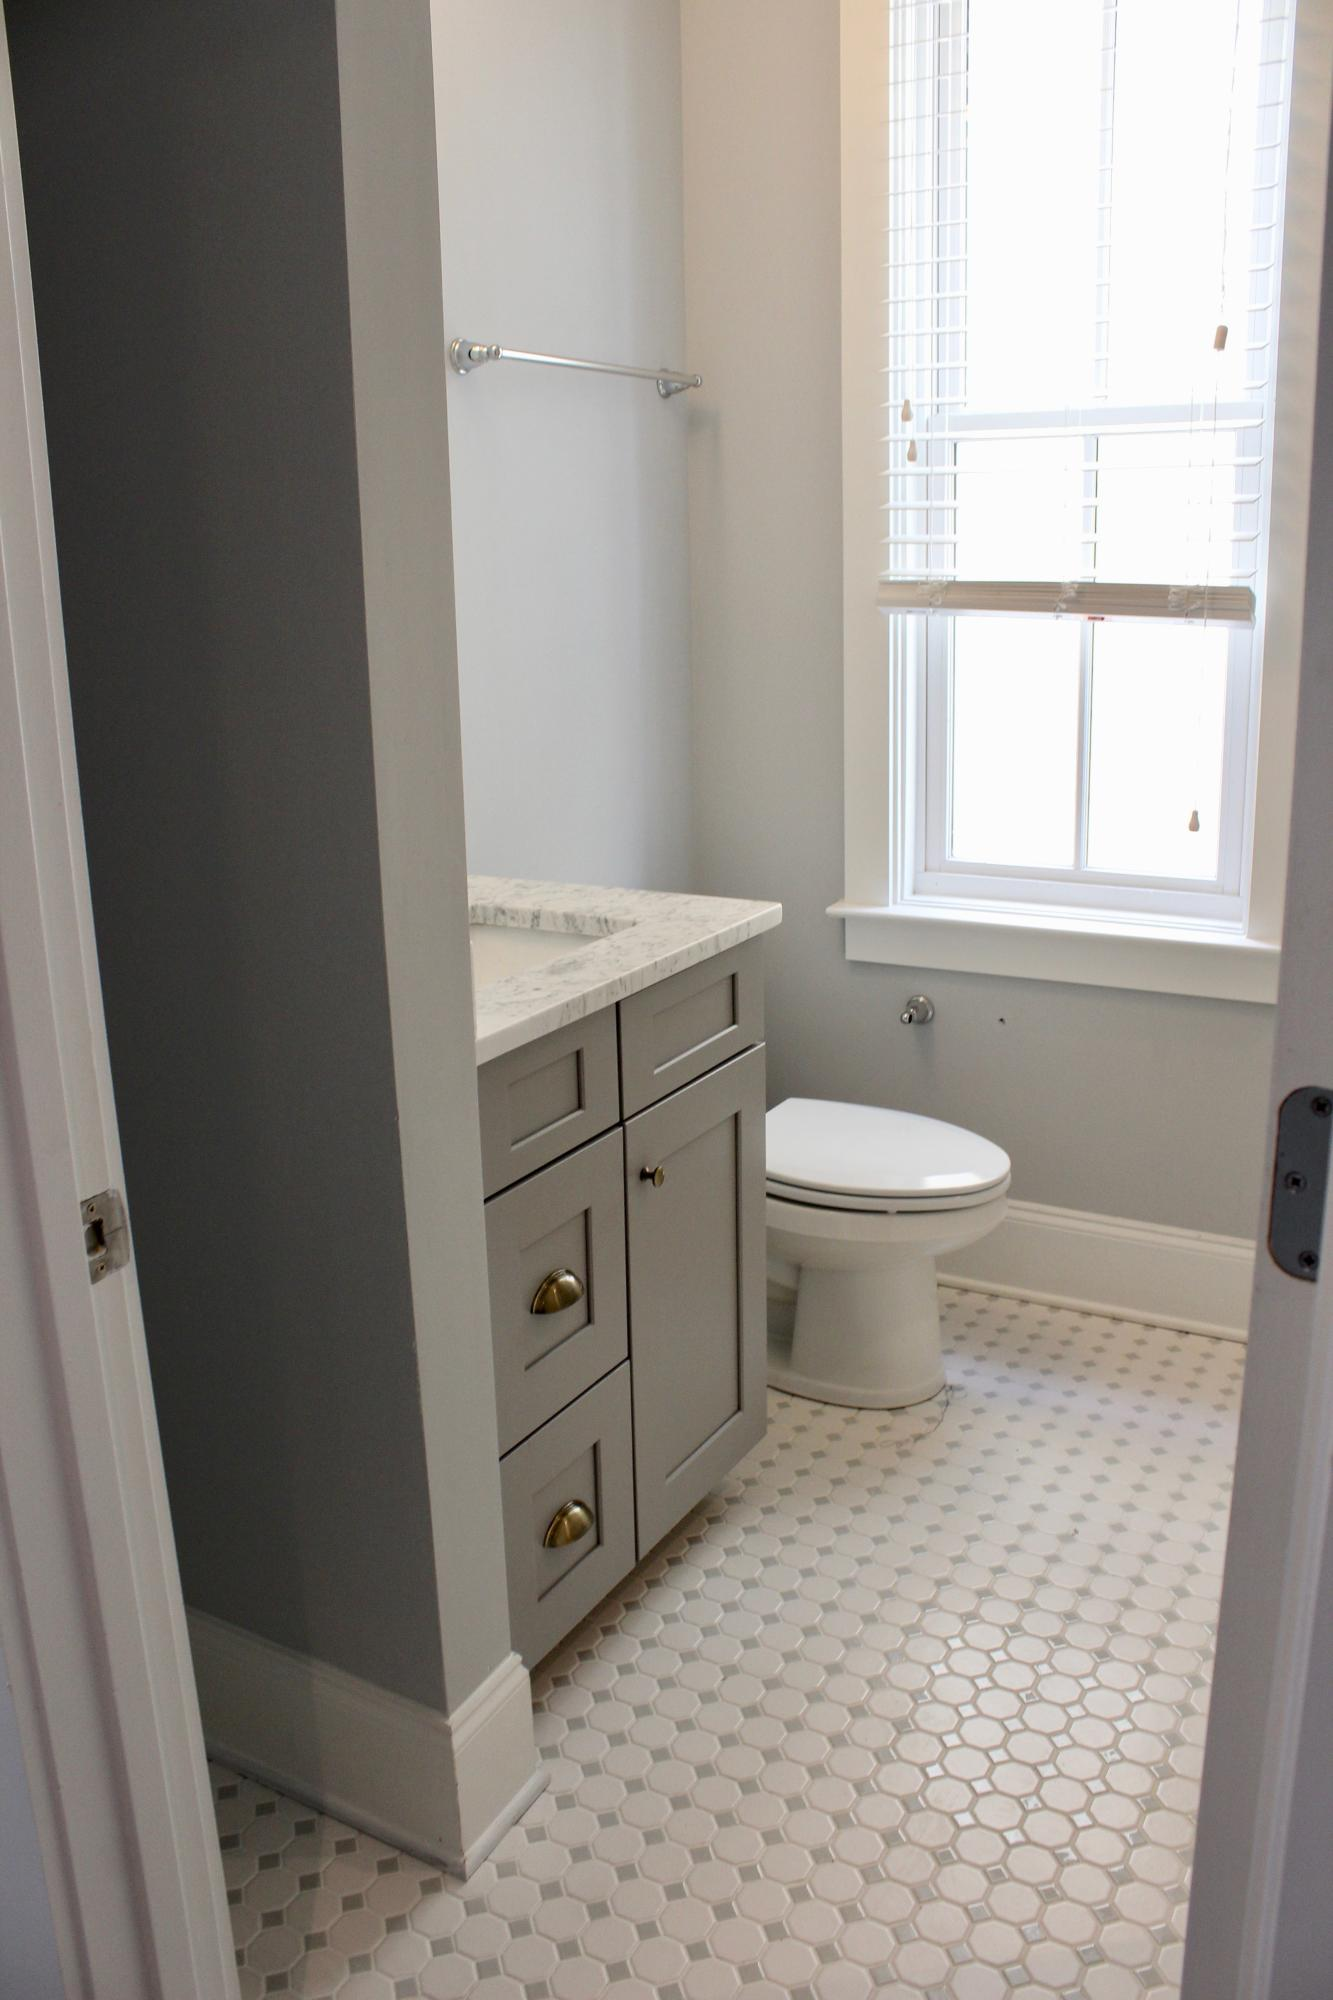 Morris Square Homes For Sale - 46 Dereef, Charleston, SC - 30